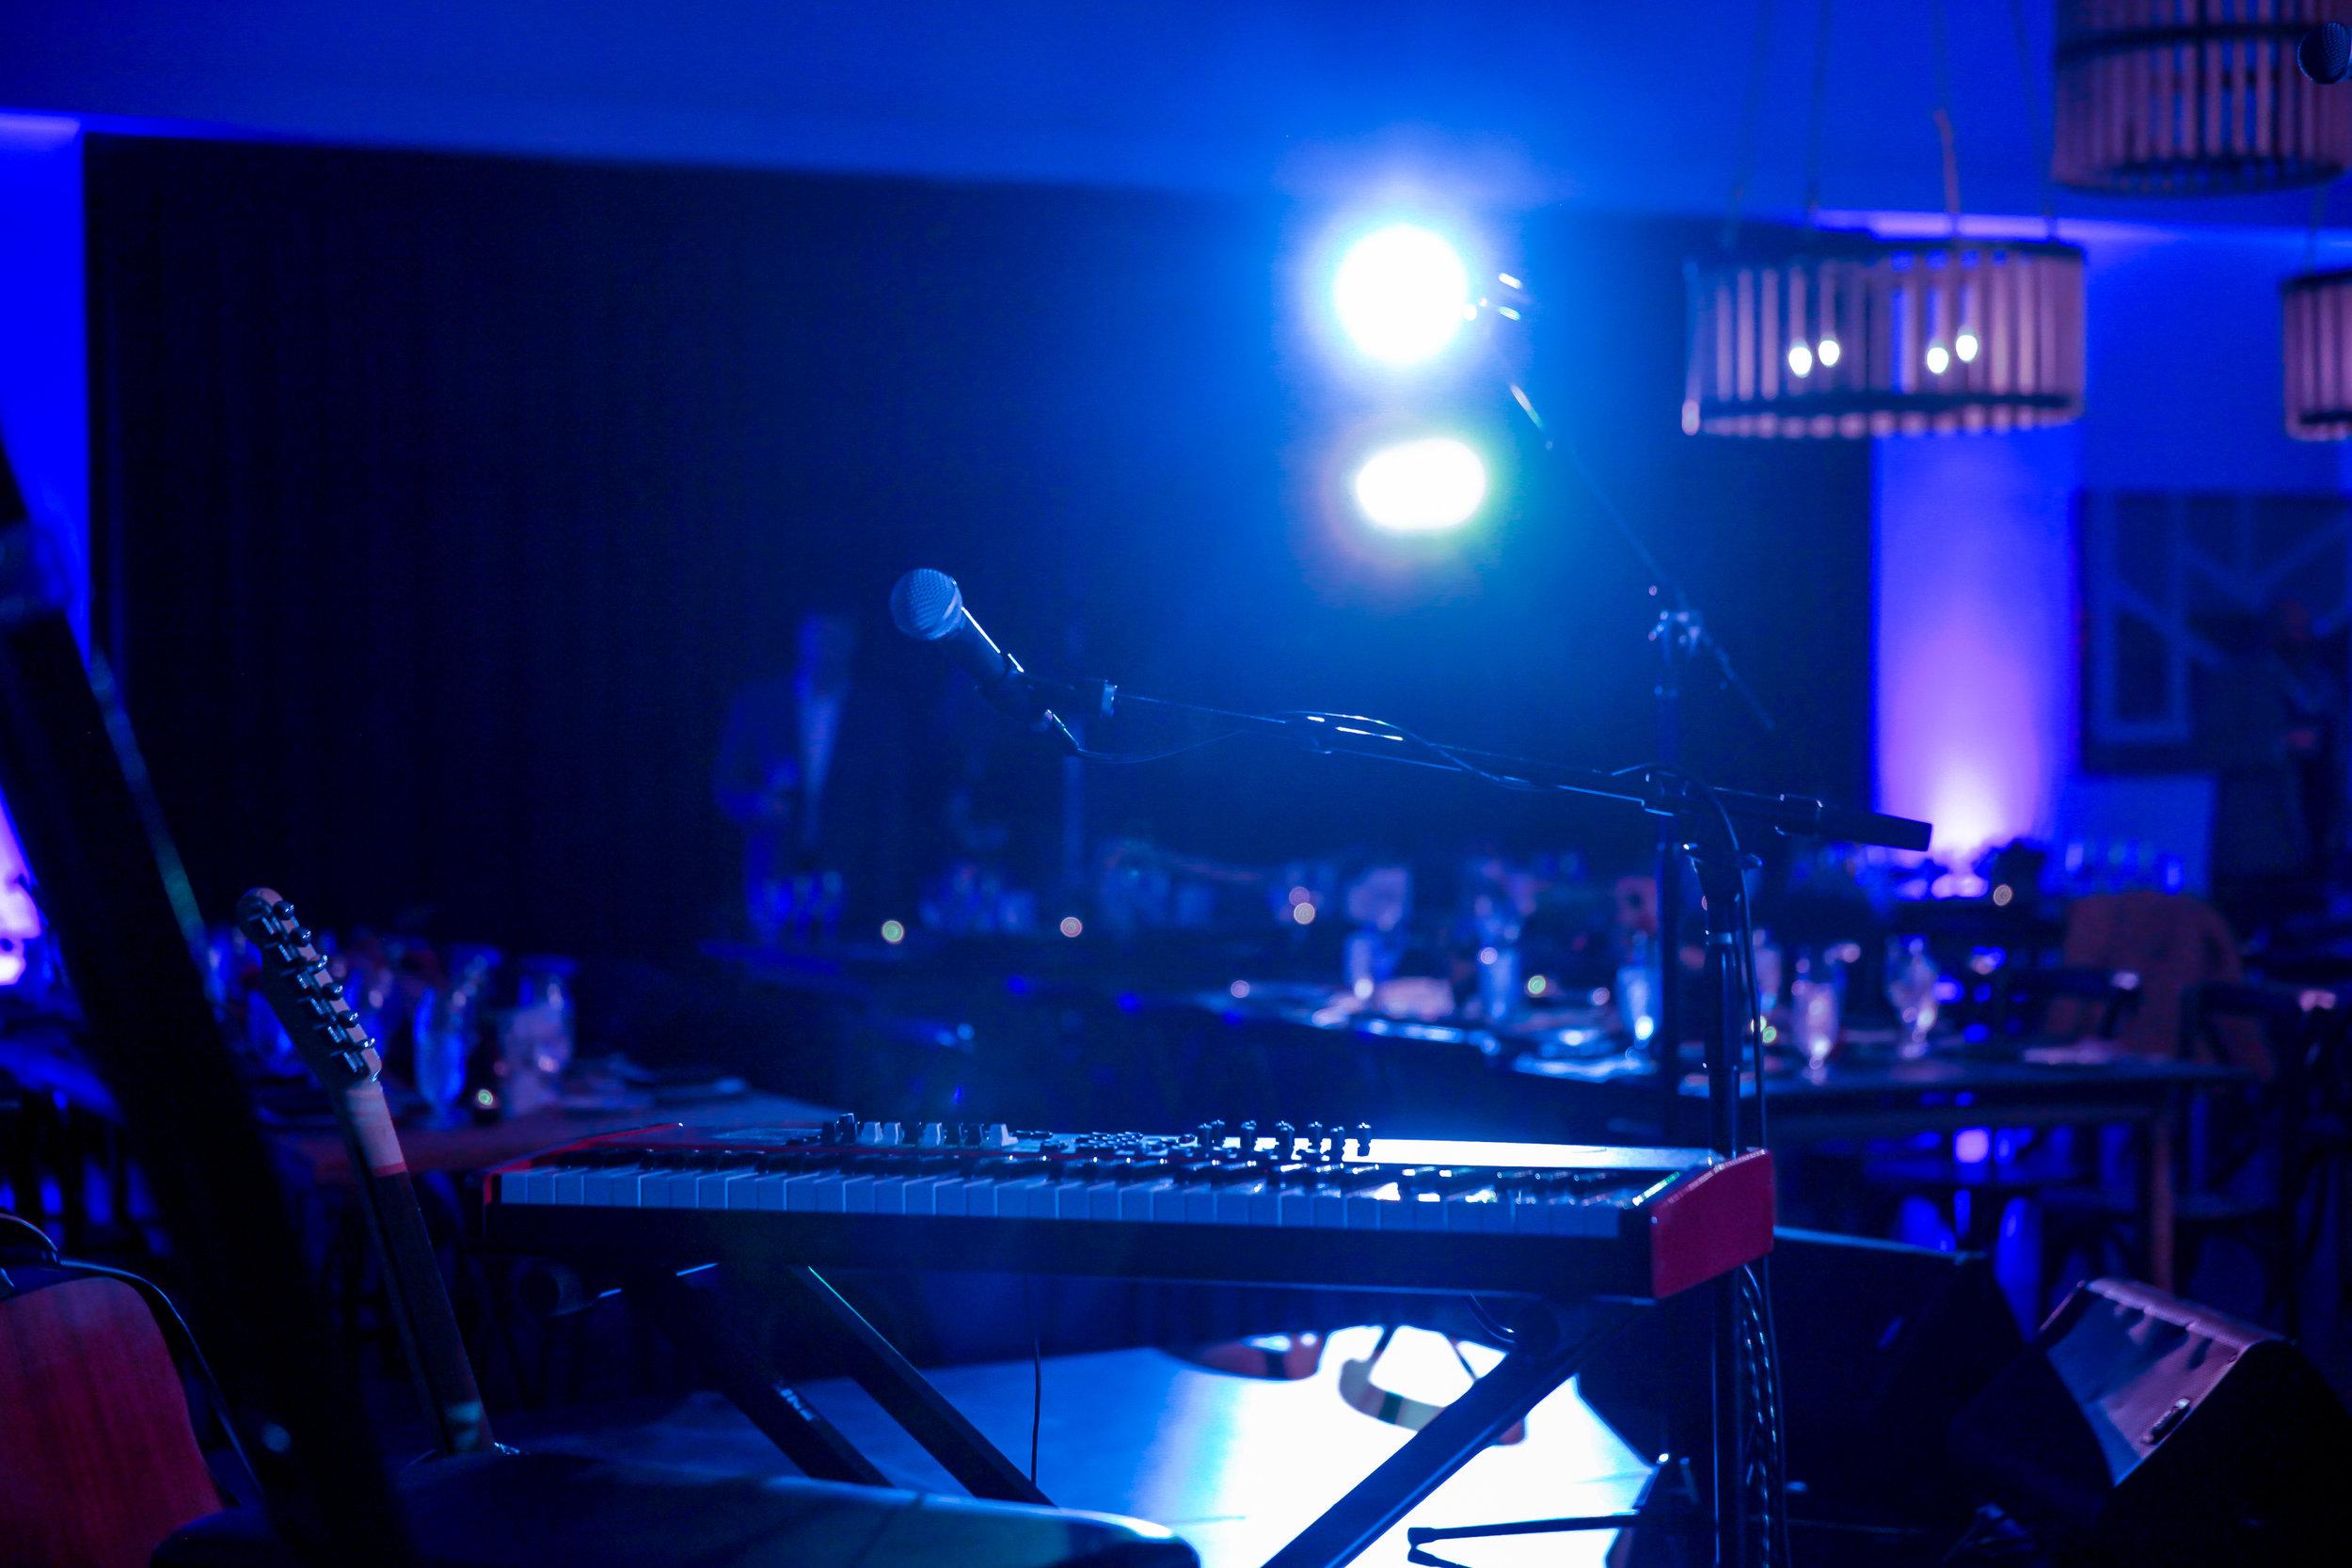 Band Backline - Nord Electro 4 Keyboard.jpg